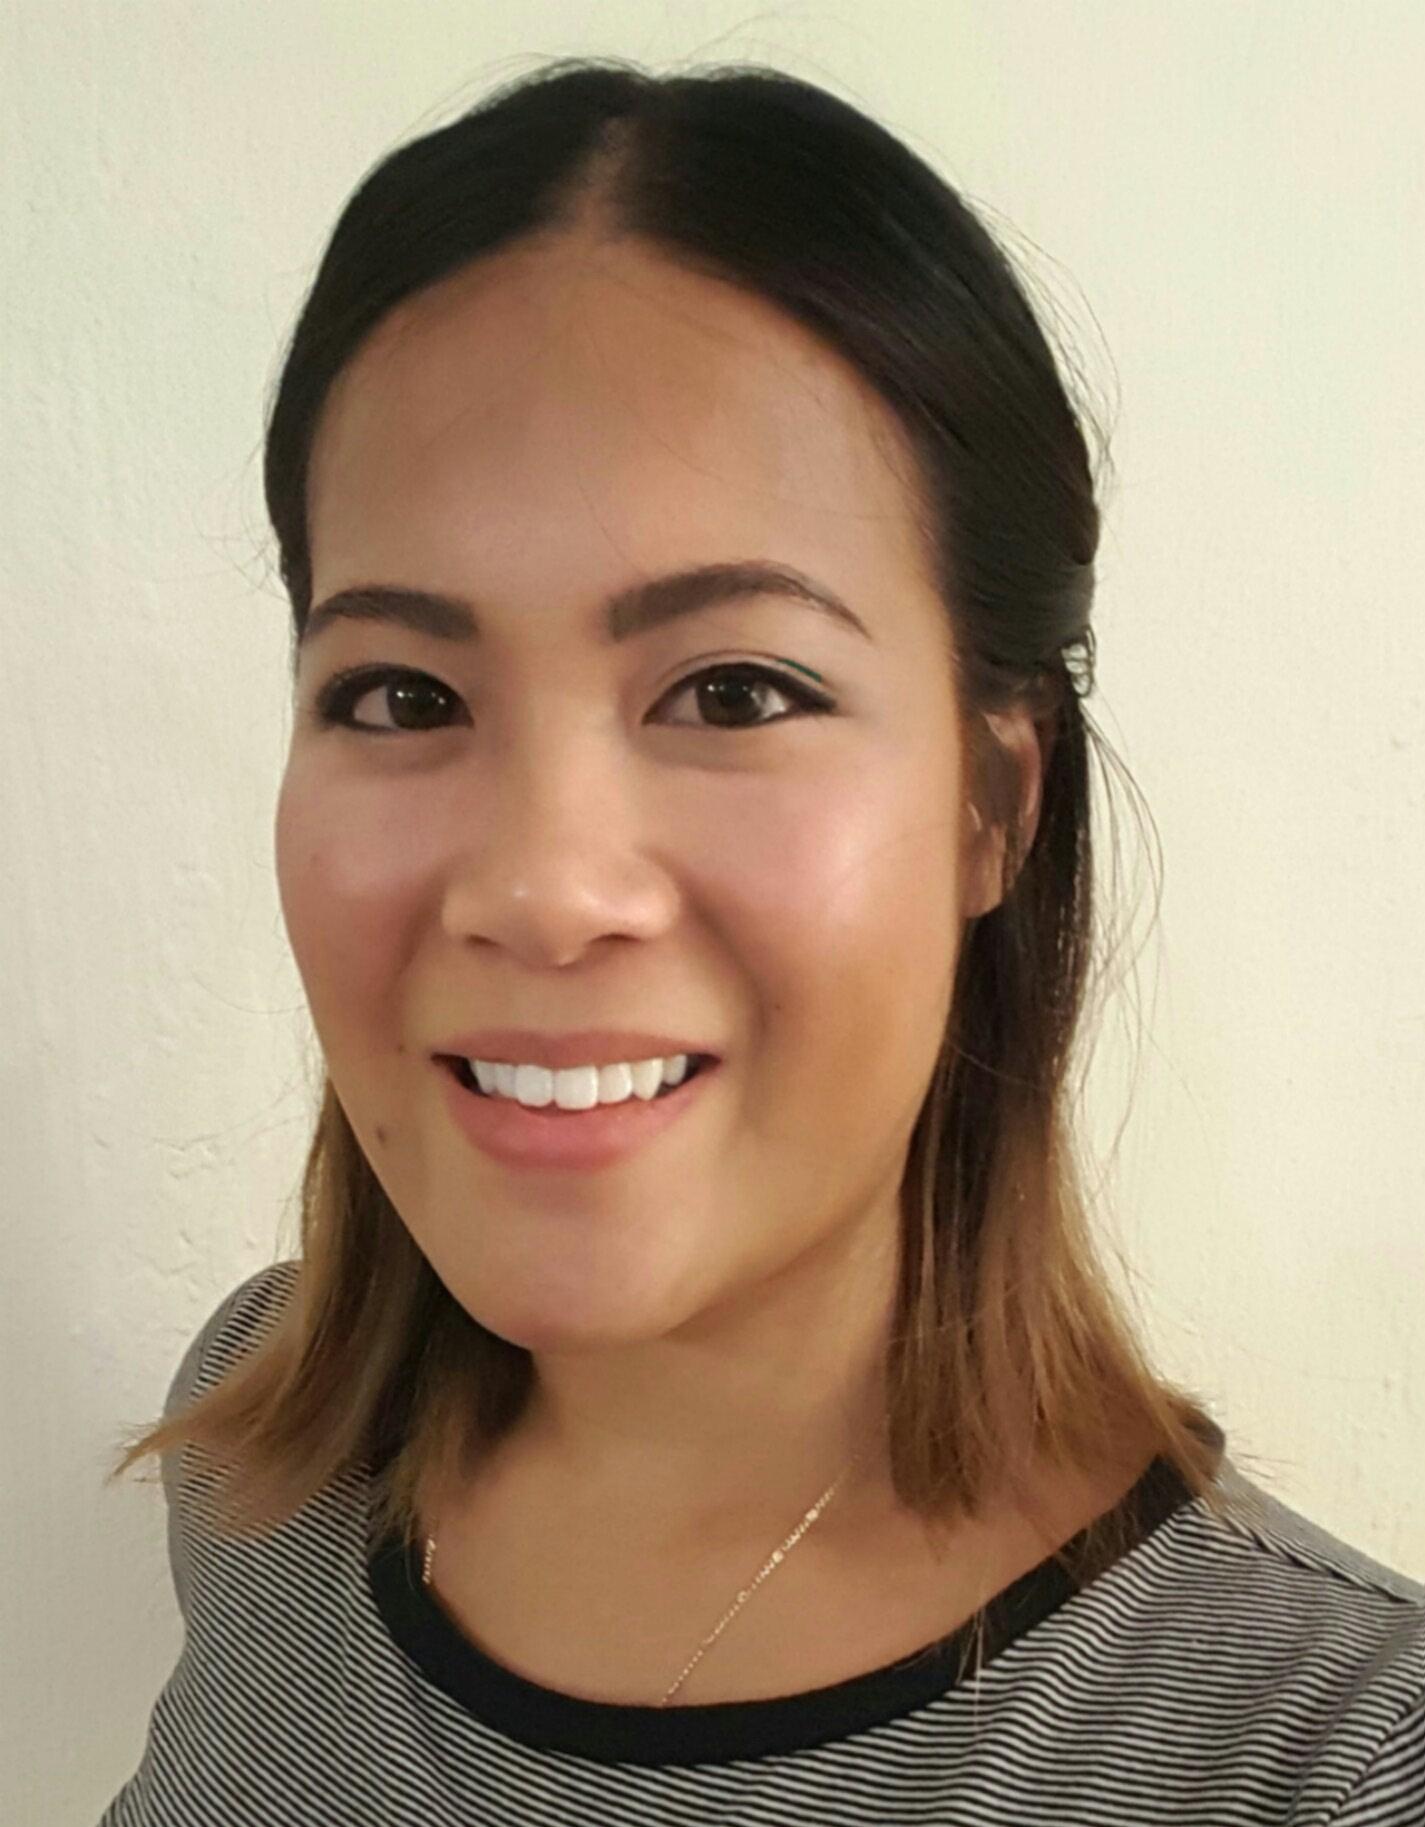 Ari Phanlouvong